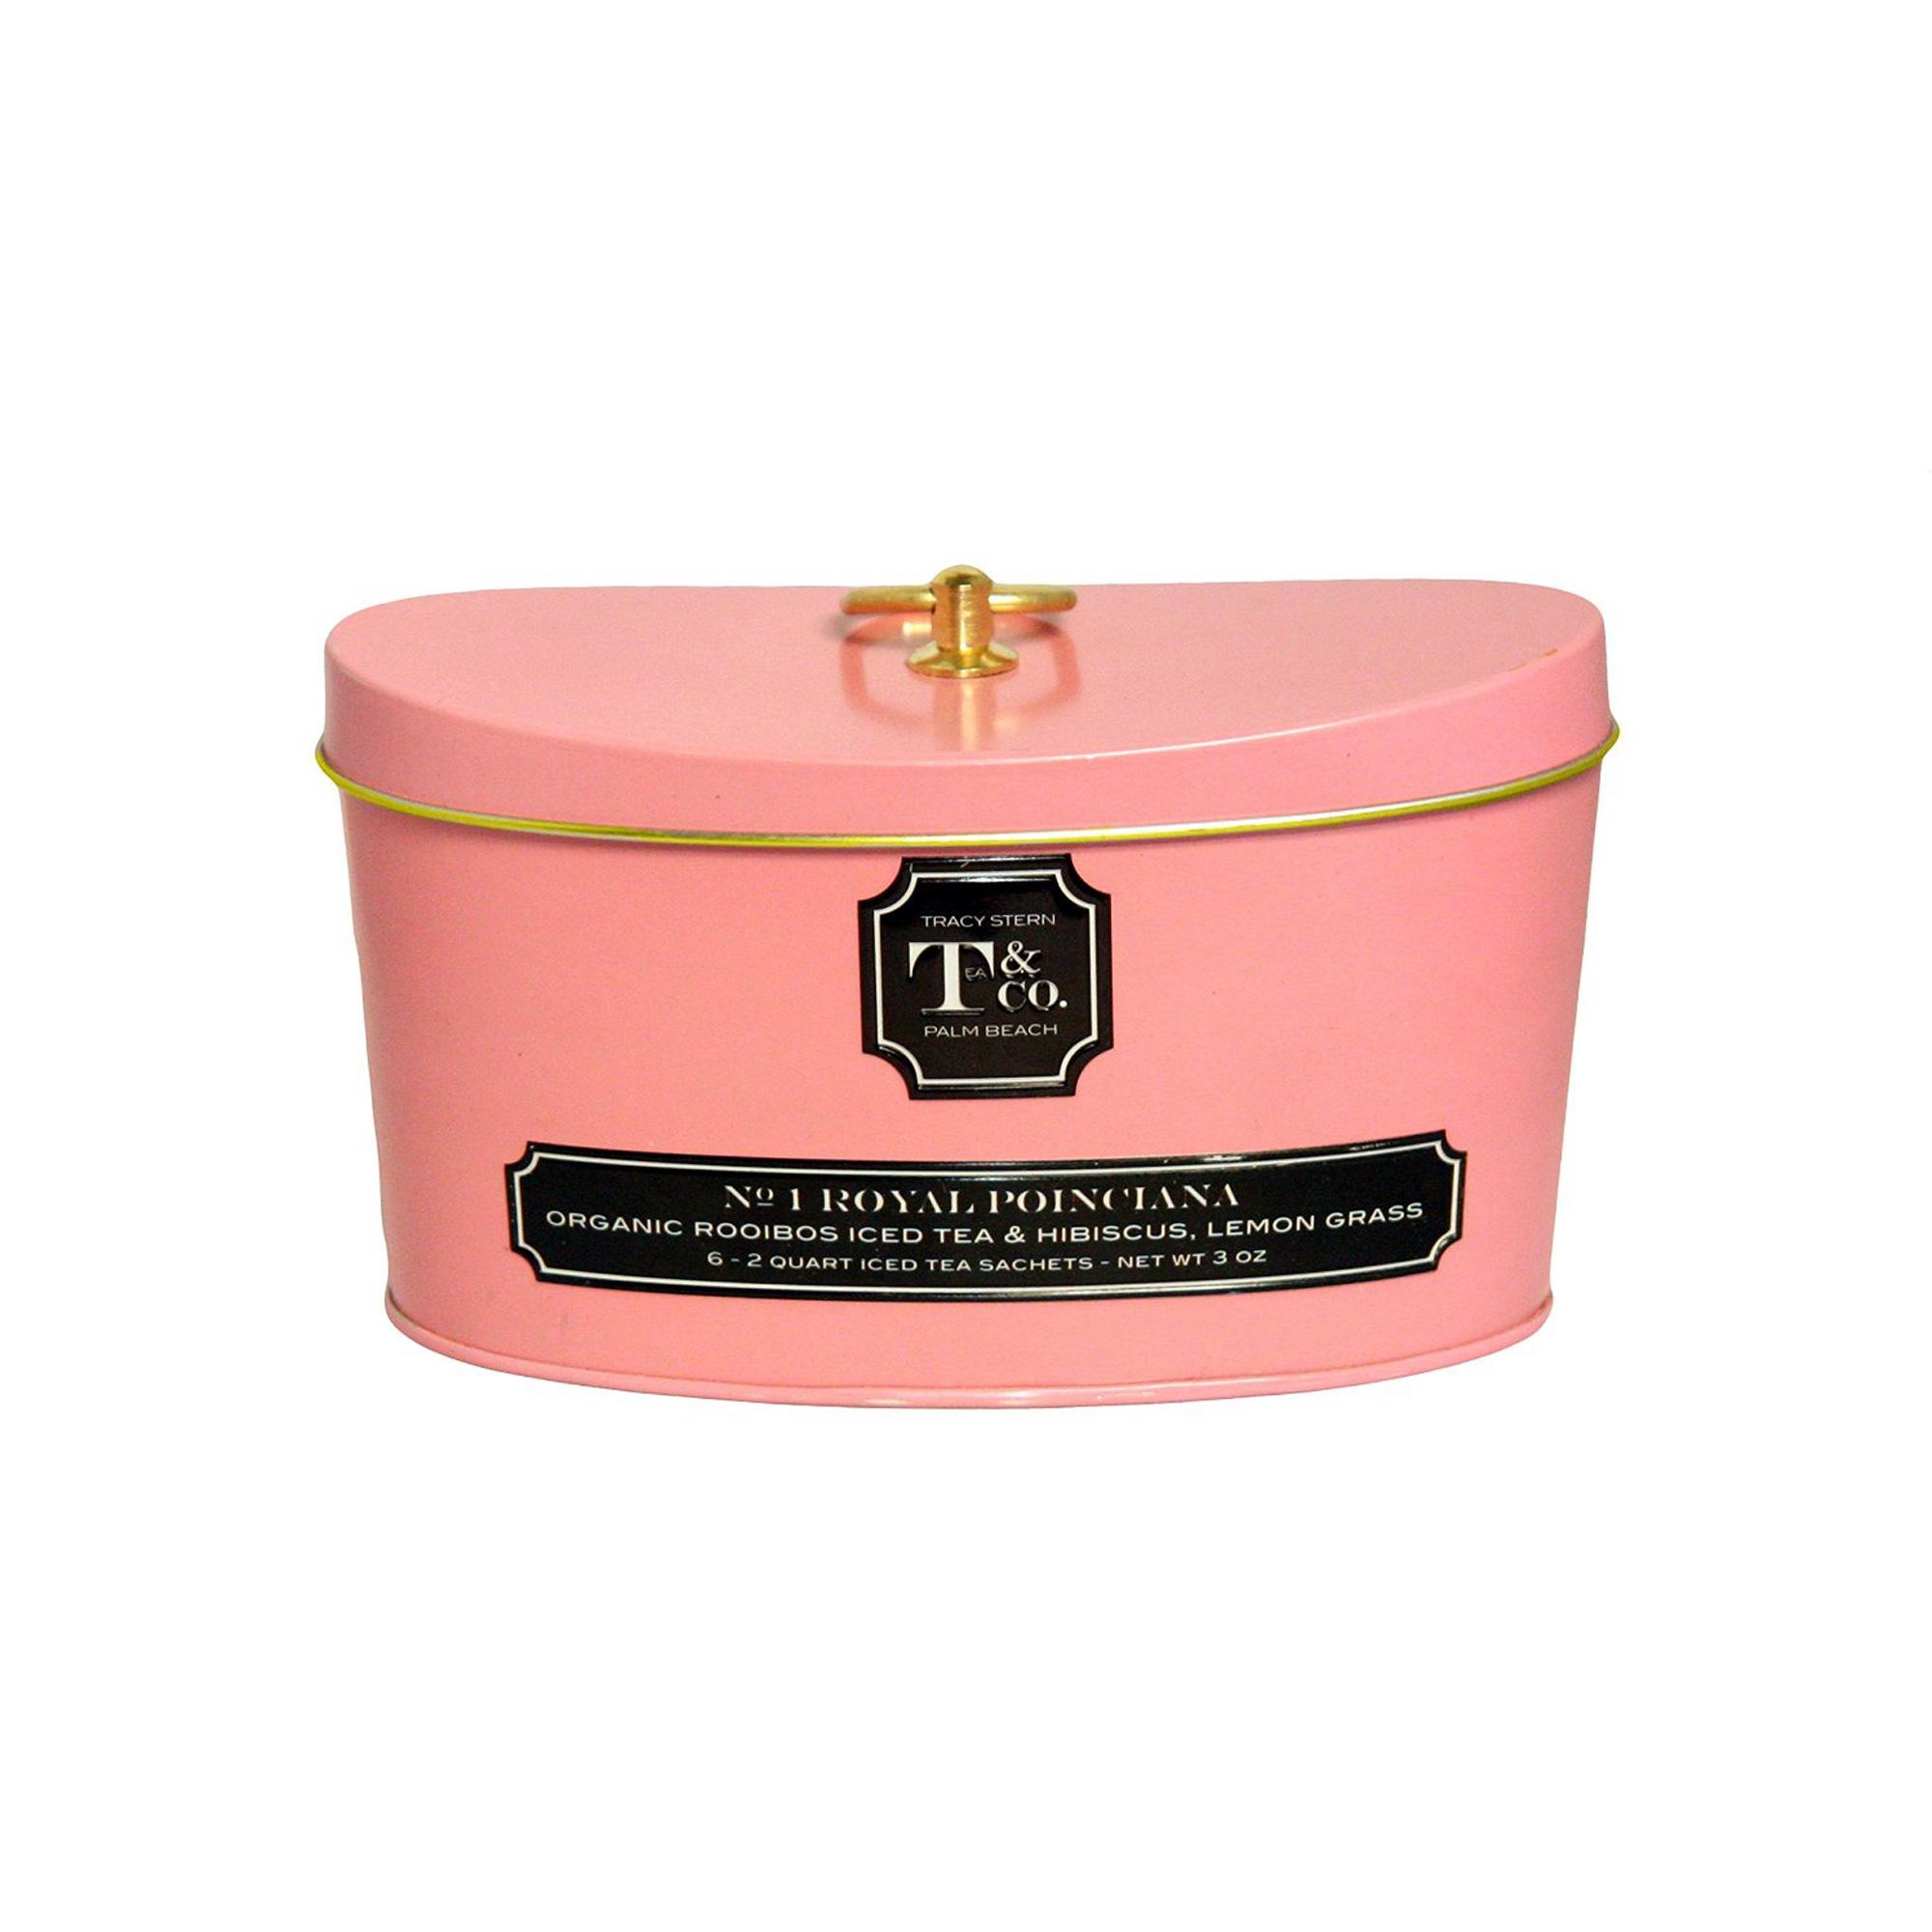 No 1 Royal Ponciana - Tracy Stern Tea & Co Iced Tea